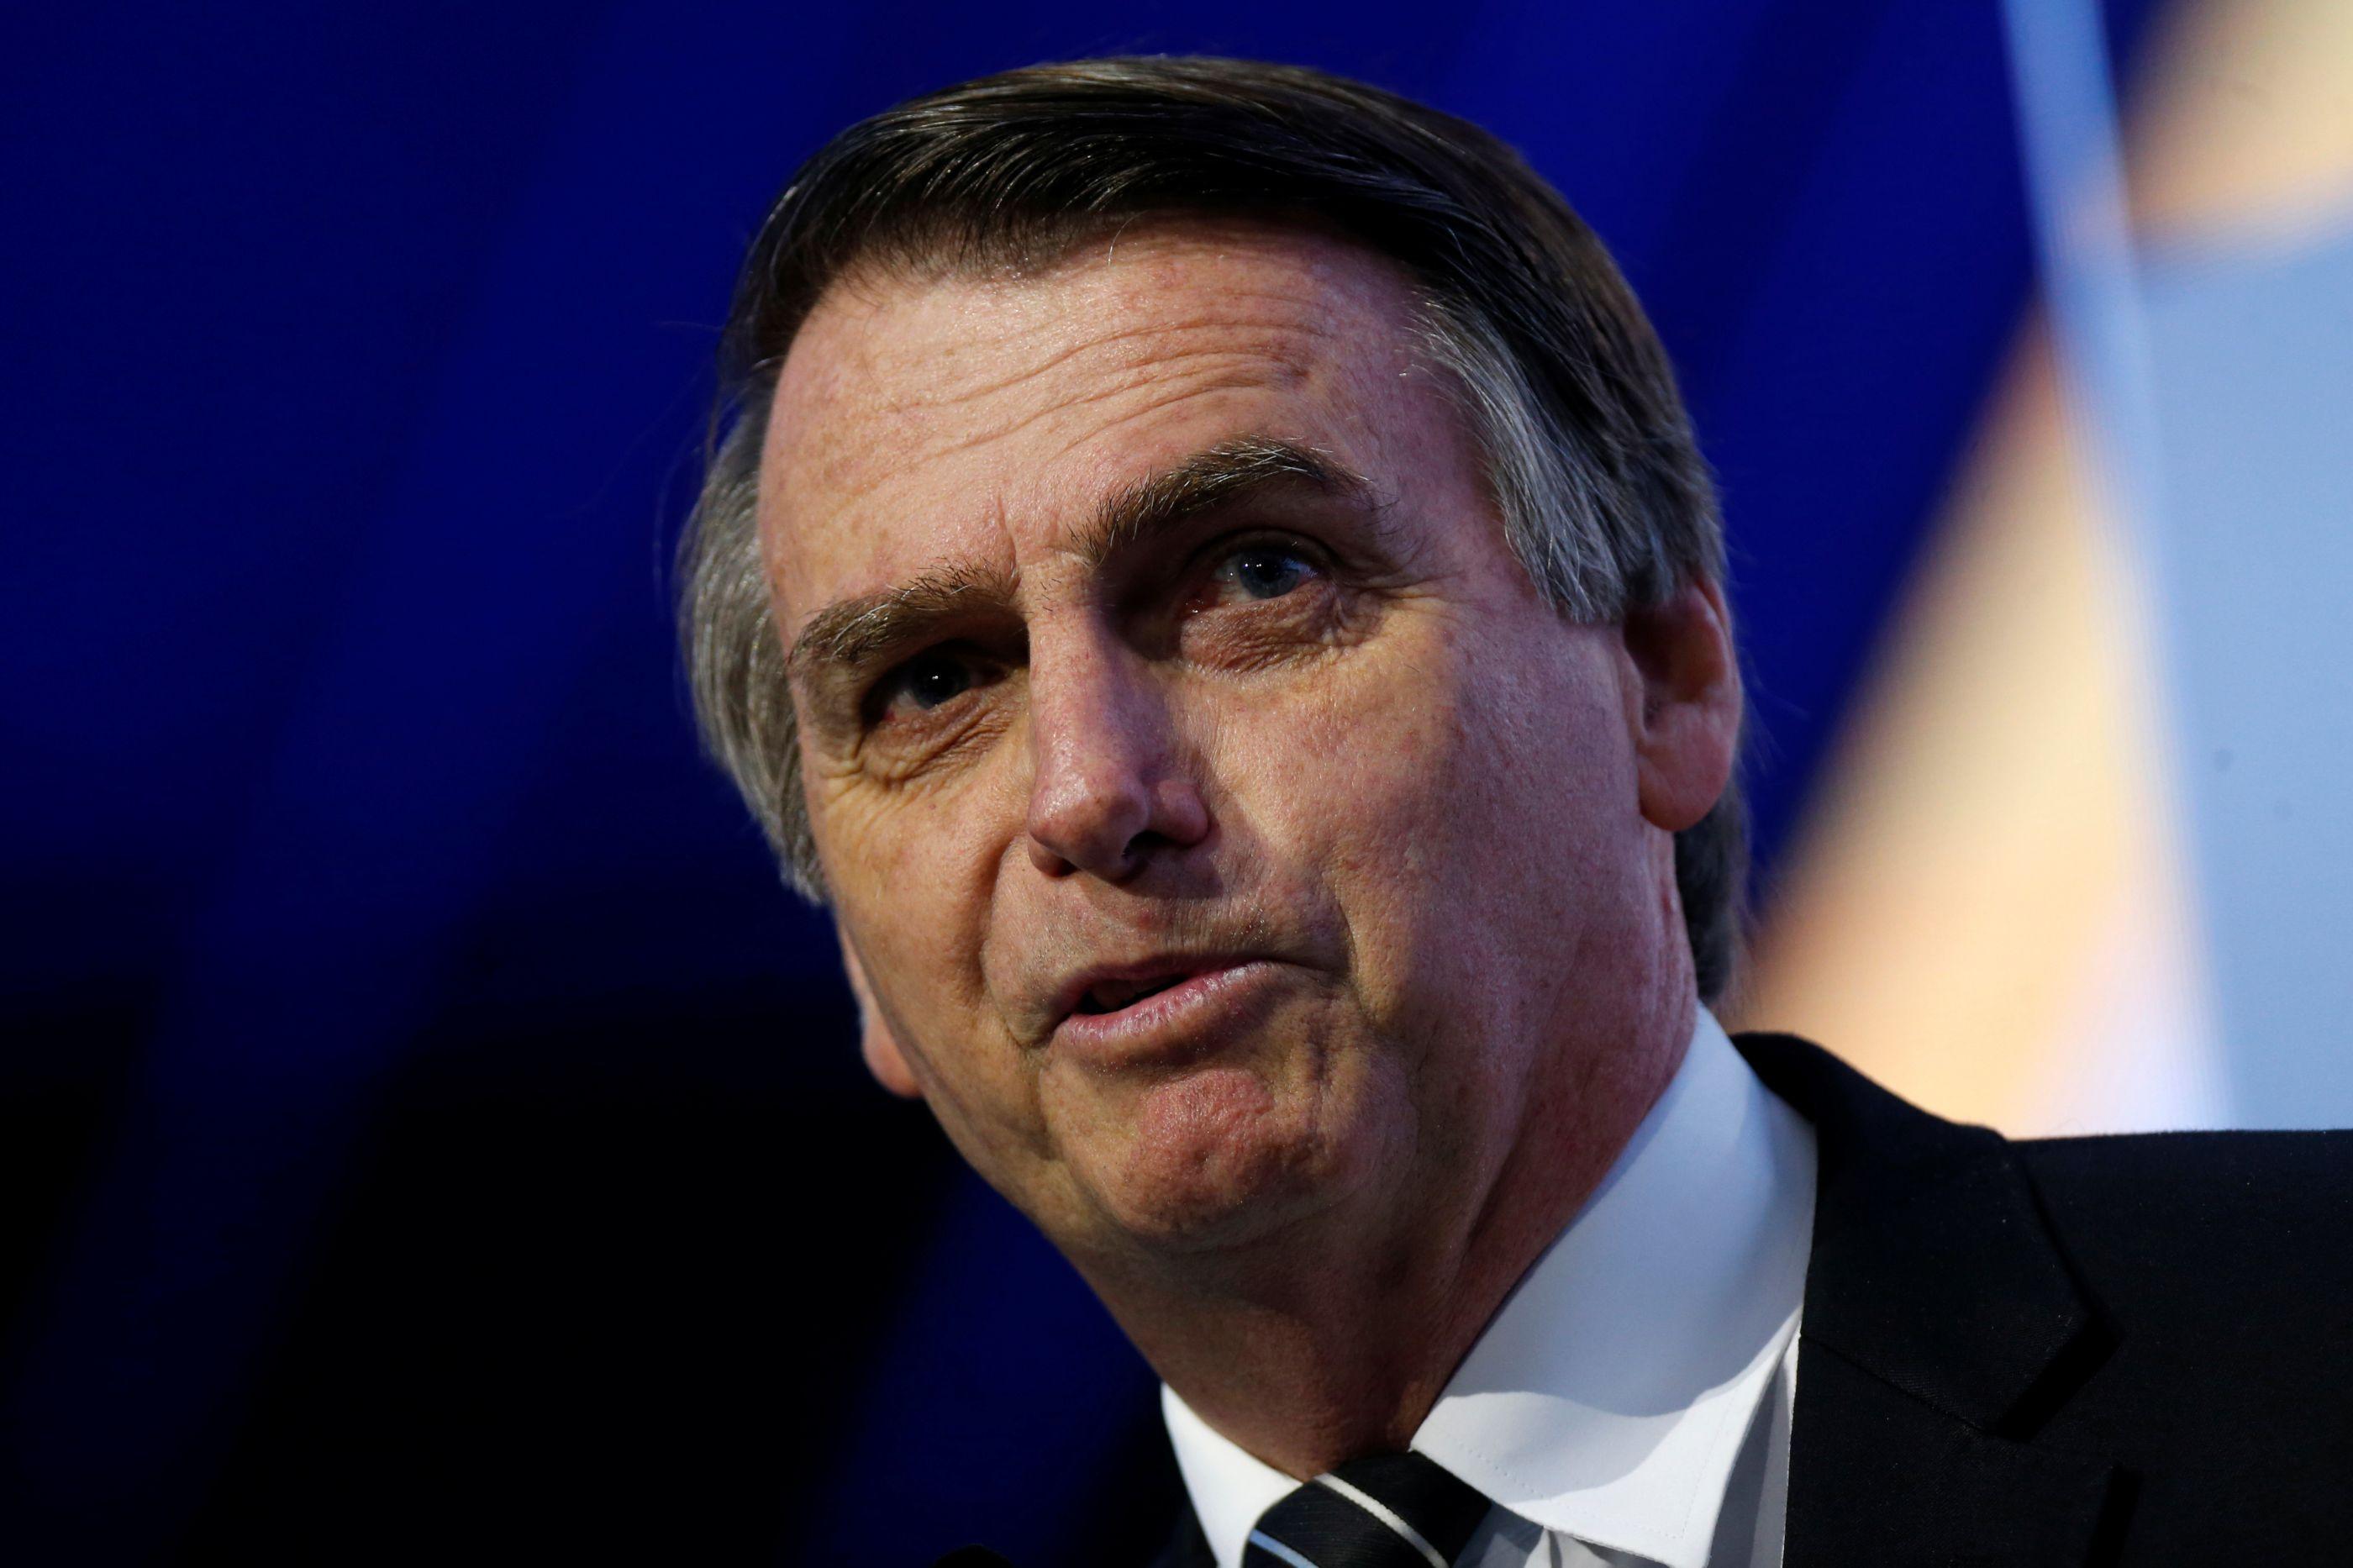 Fernando Henrique Cardoso e Bolsonaro trocam farpas no Twitter